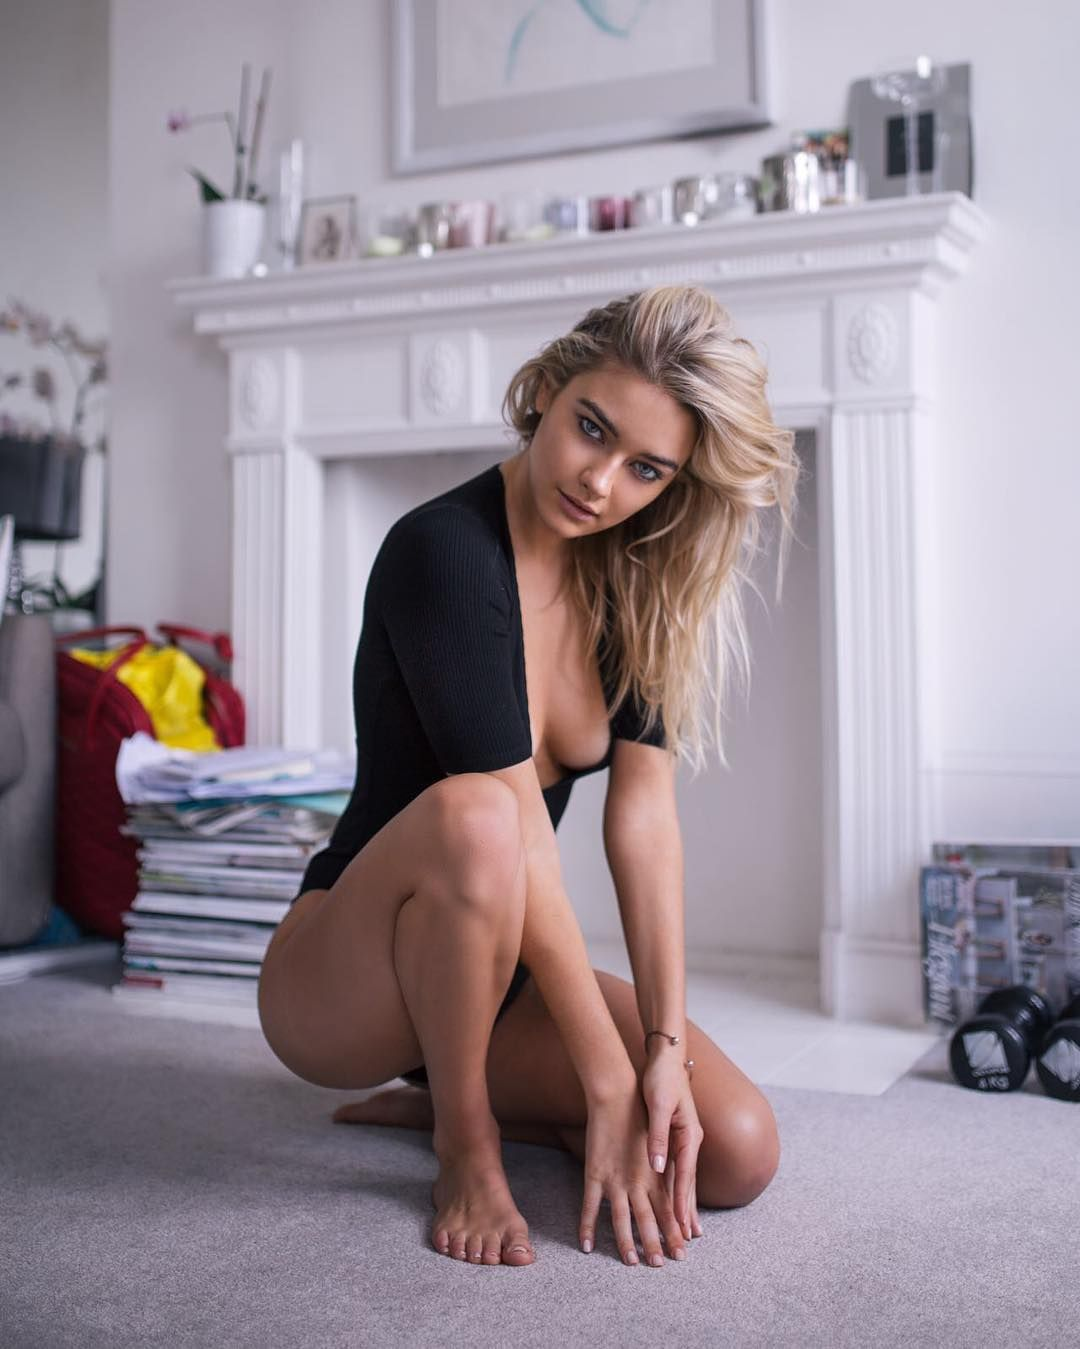 Topless Video Tess Jantschek naked photo 2017